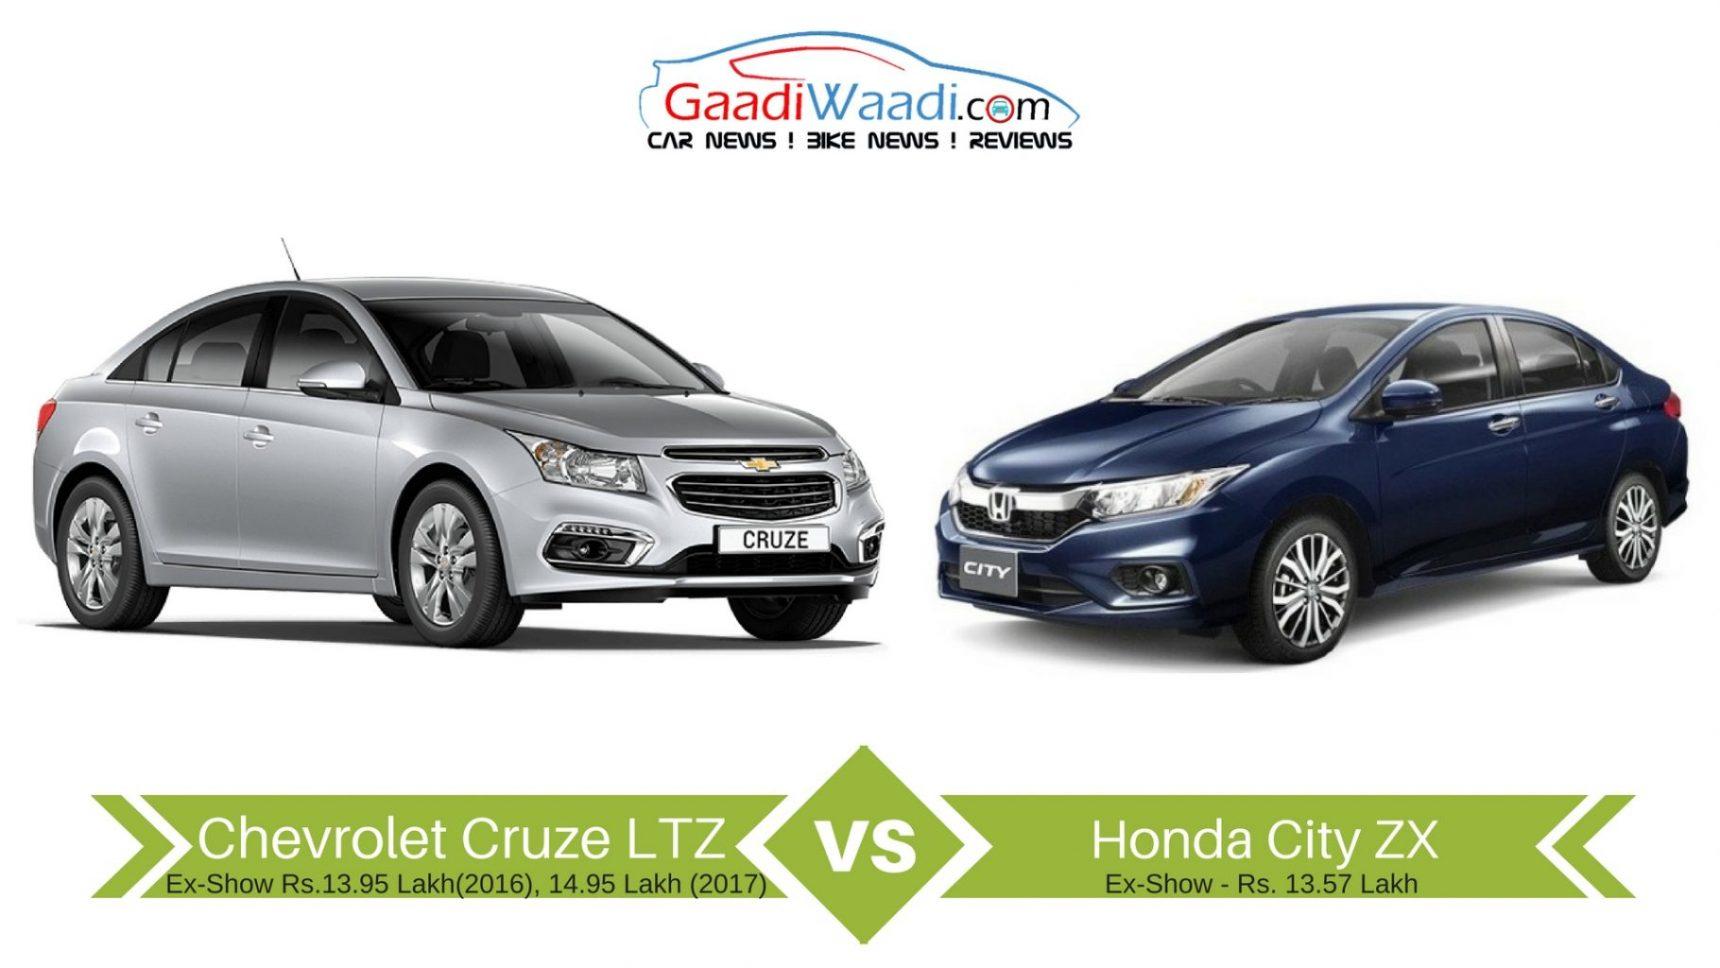 New Honda City Vs Chevrolet Cruze Specs Comparison